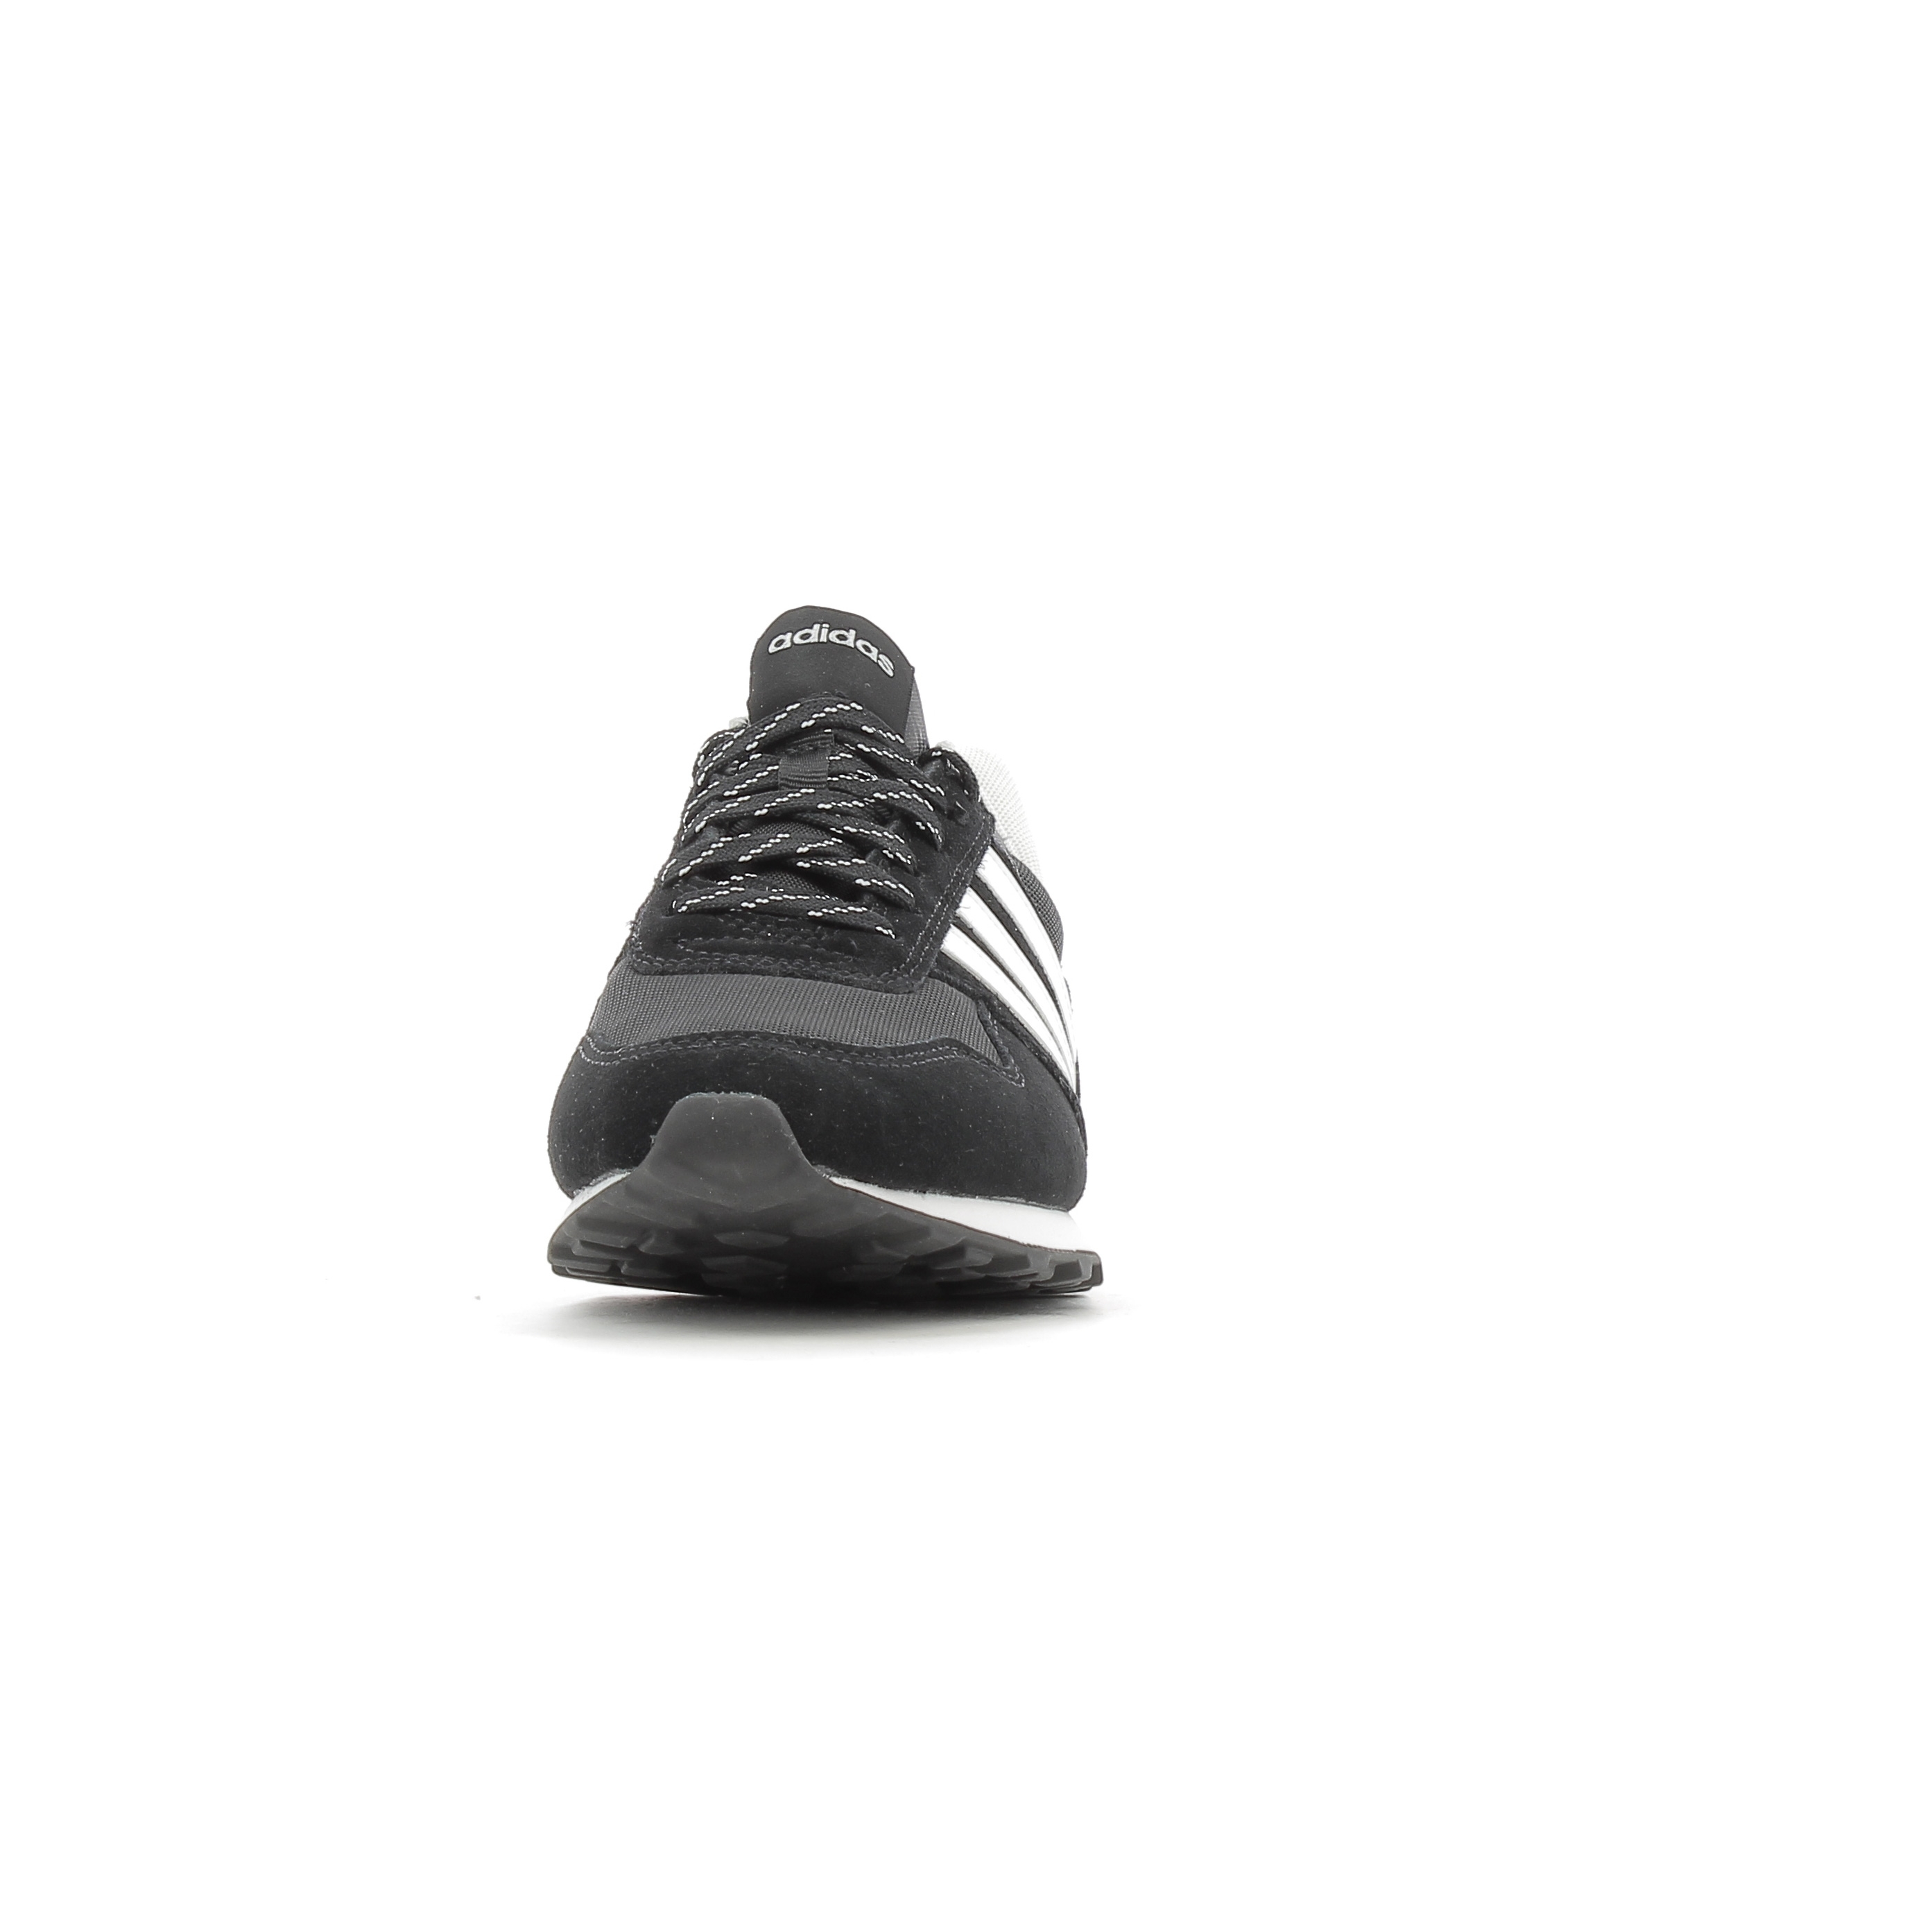 promo code 08771 b911a Baskets basses Adidas Performance 10K W